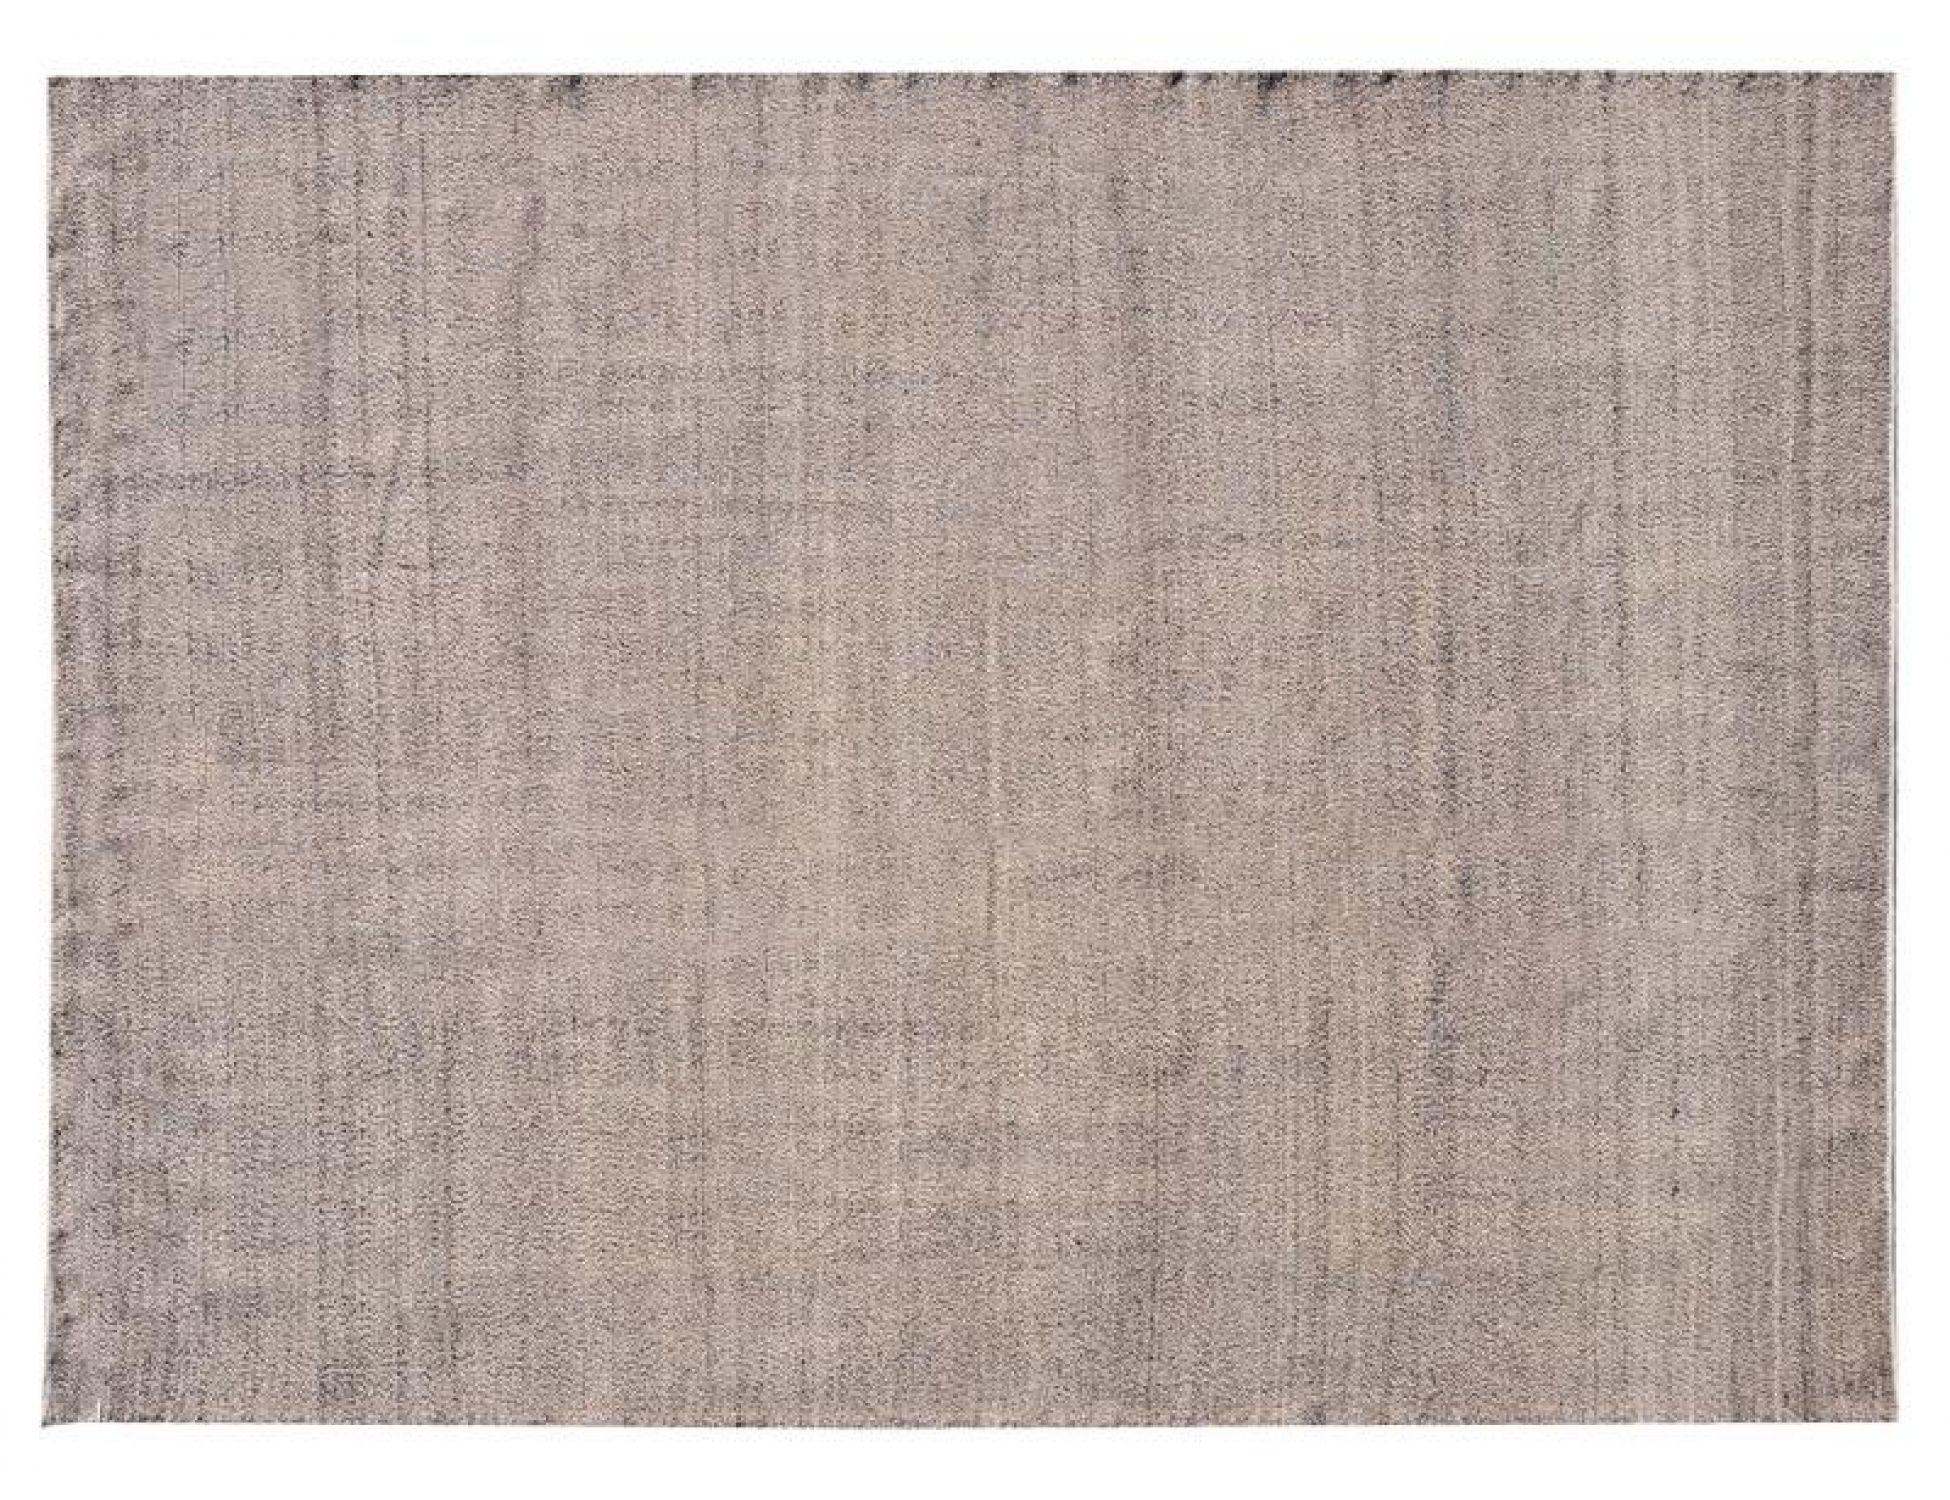 PERSIAN WOOL KILIMS   <br/>297 x 207 cm